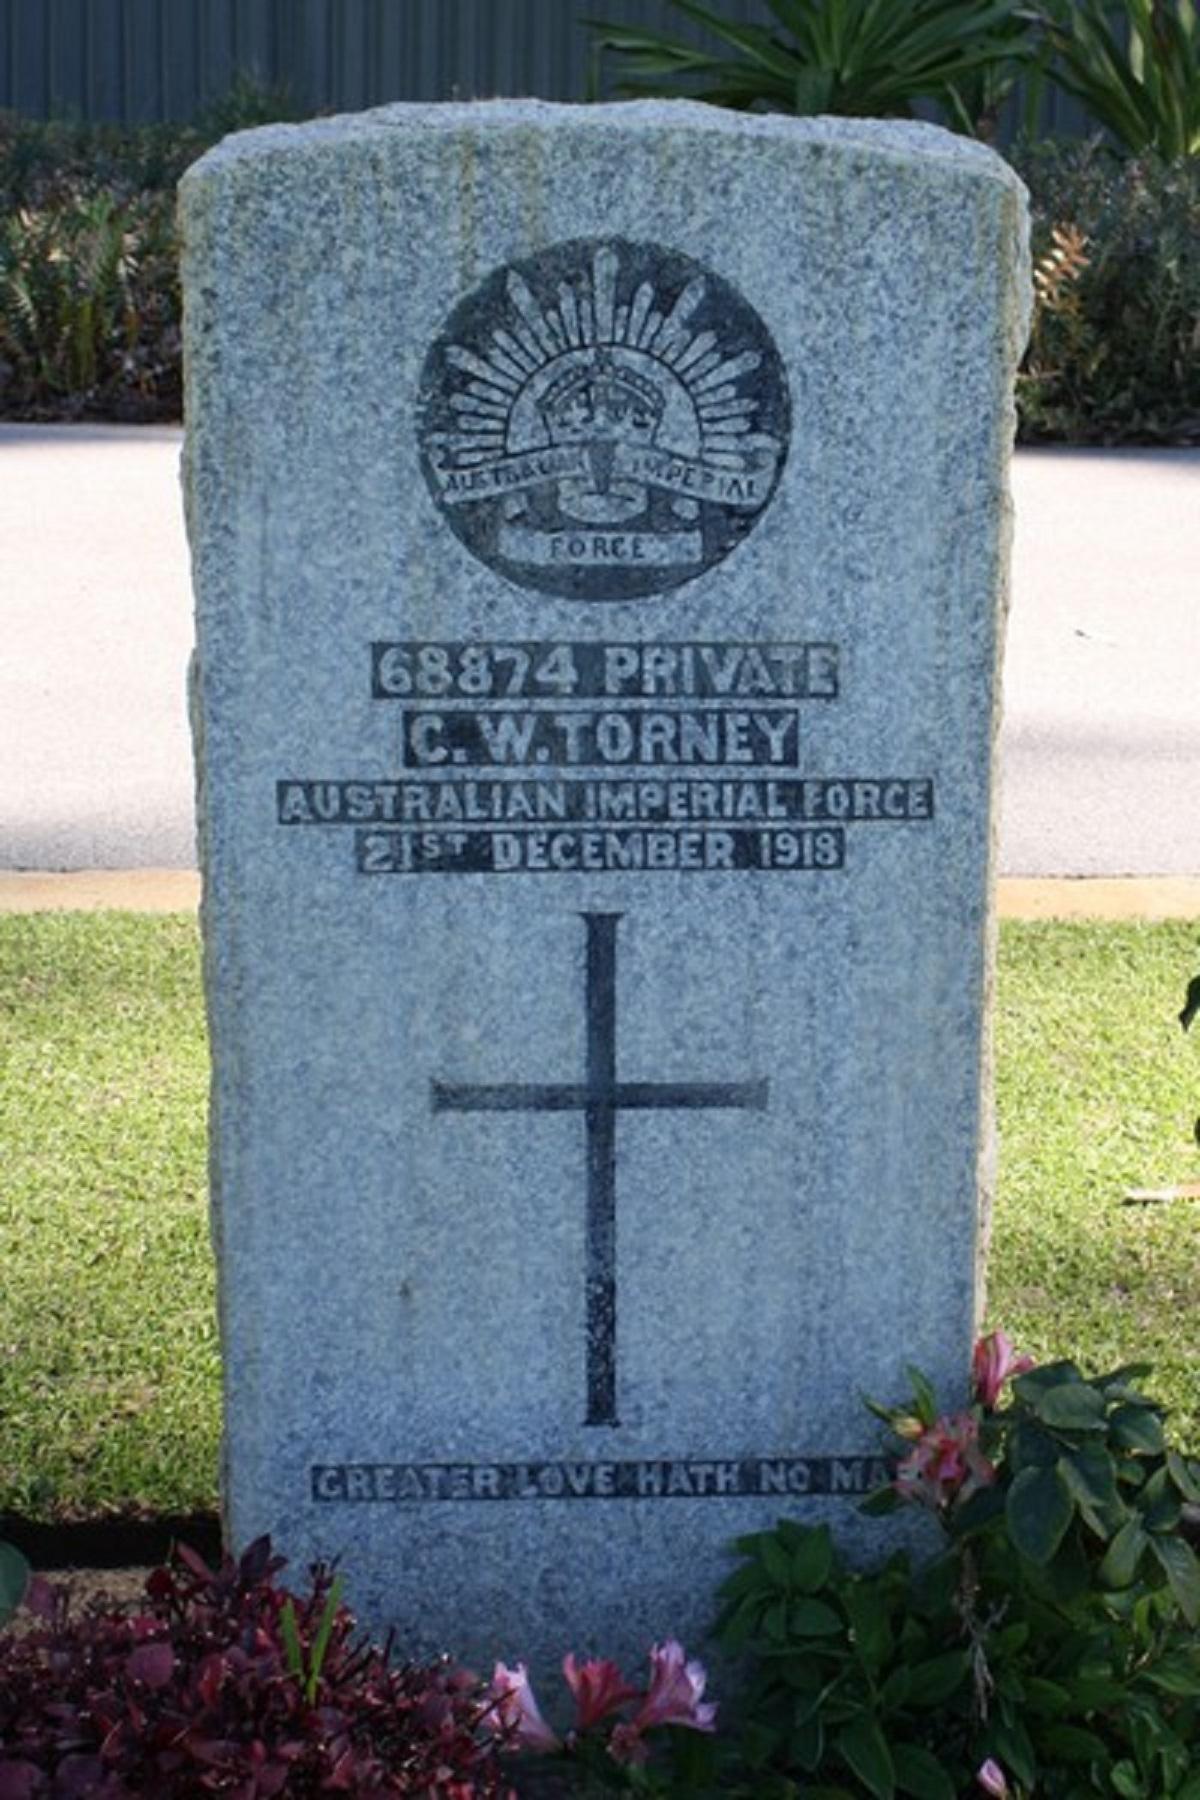 68874_Private_Clarence_William_Torney - Vitual War Memorial Australia